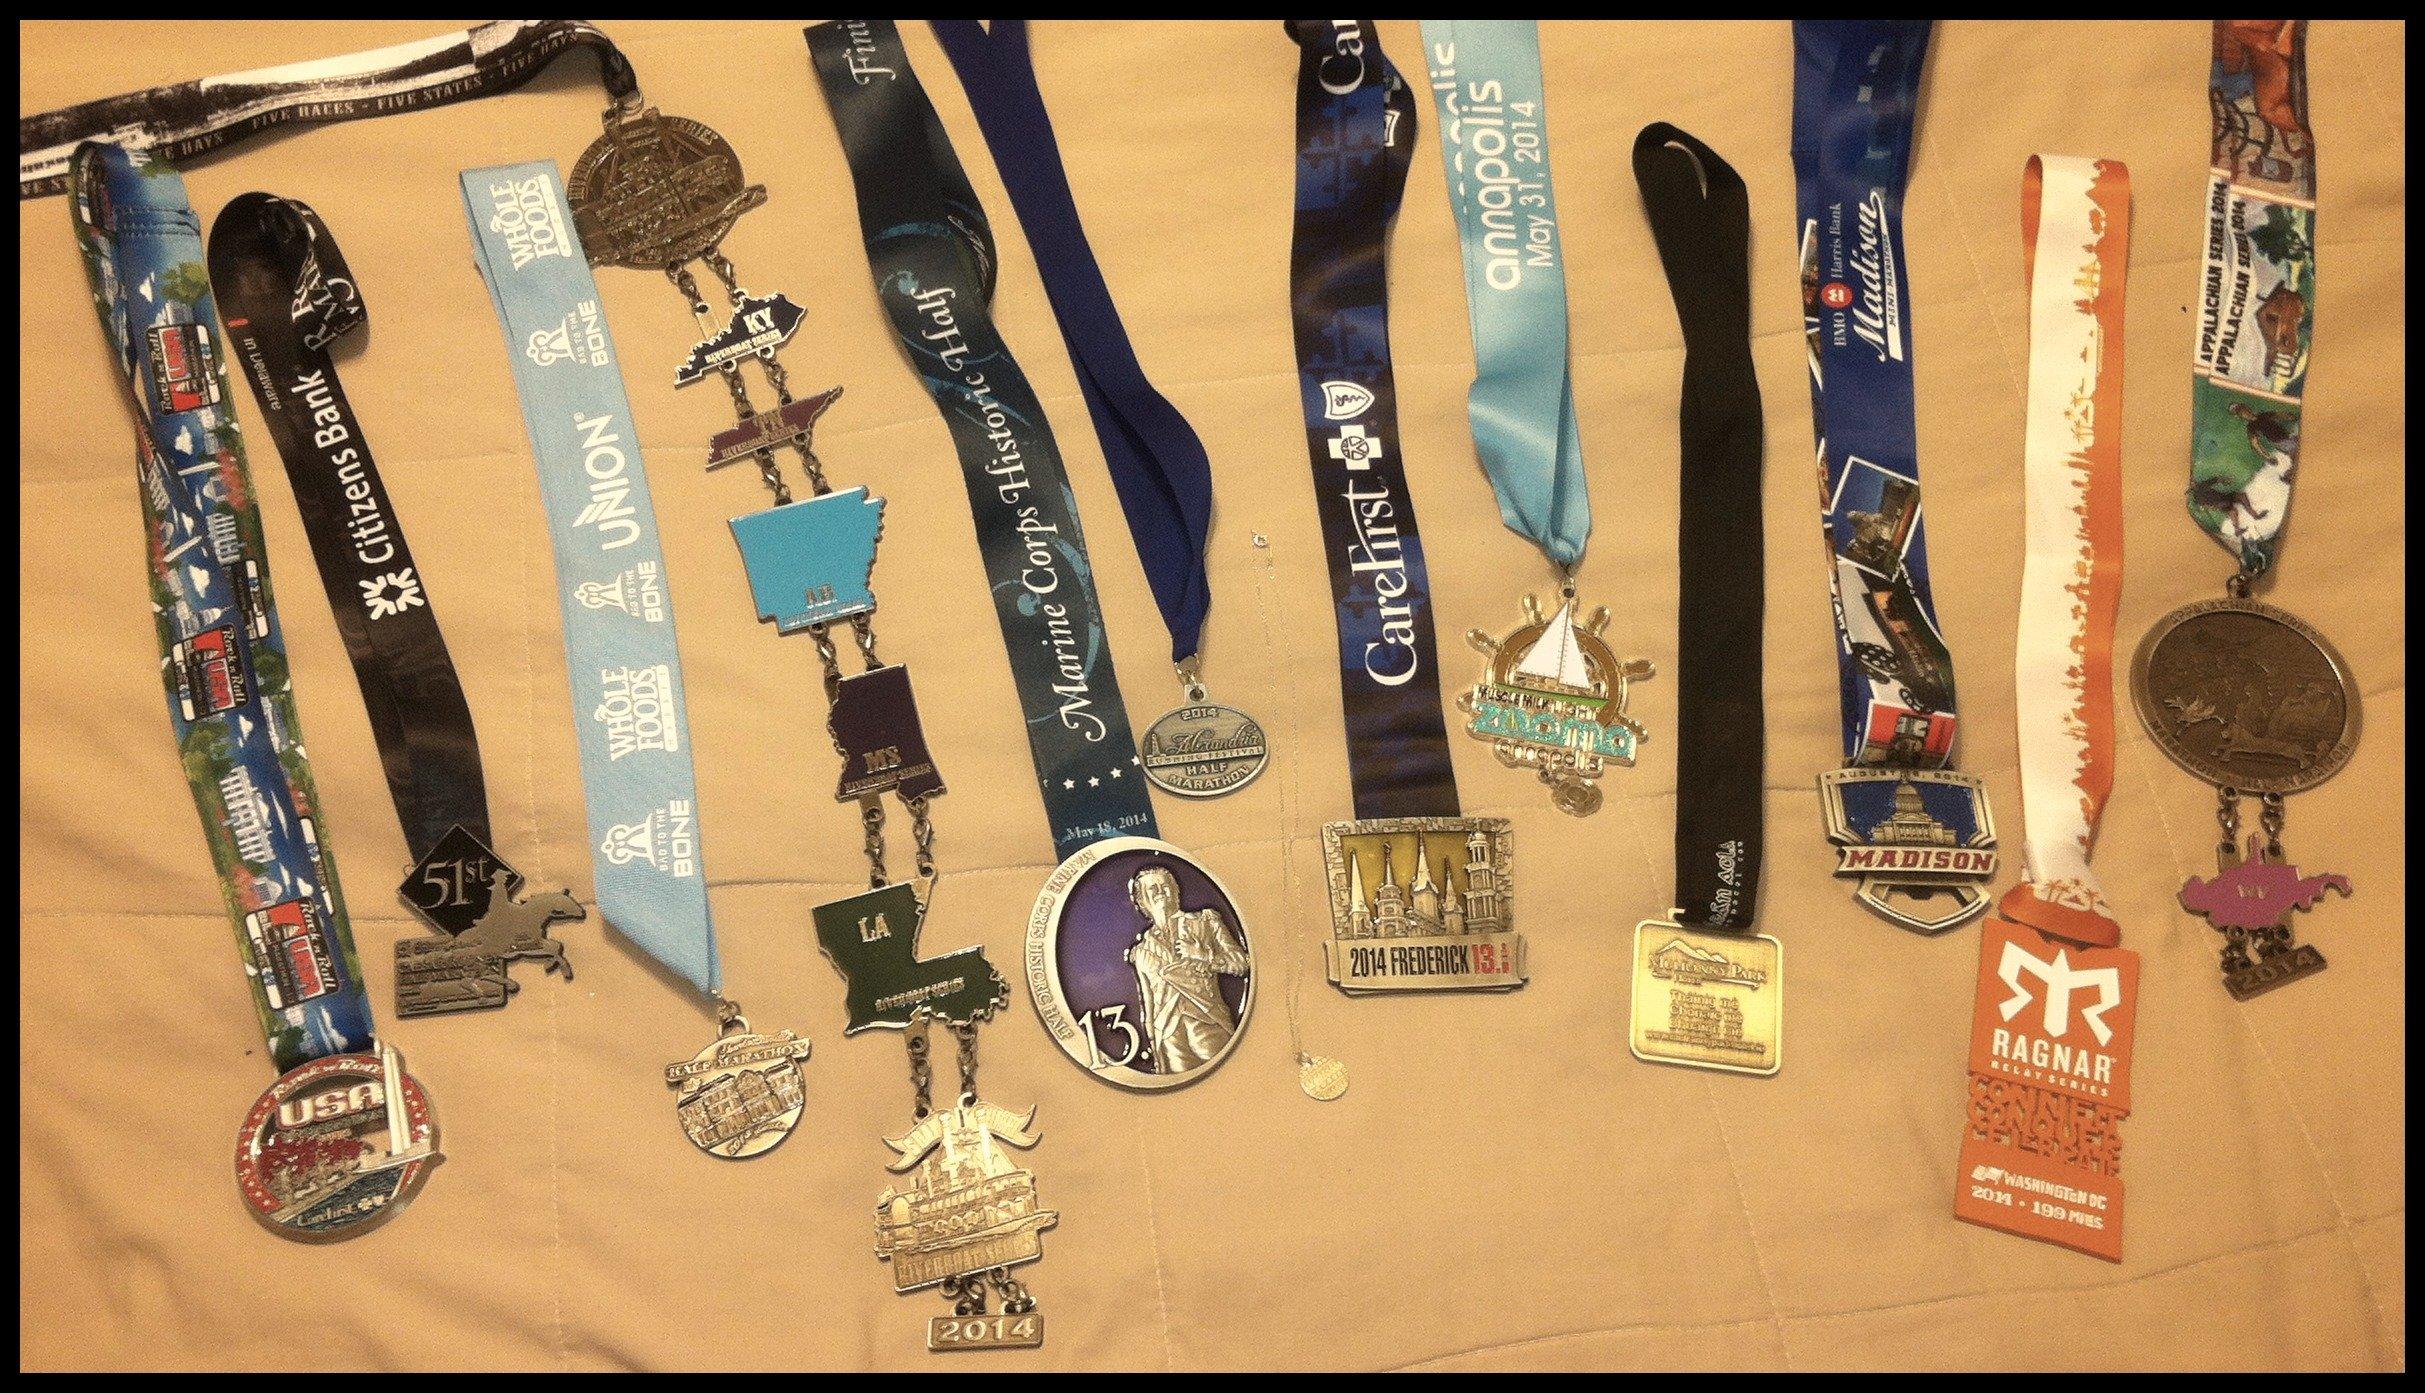 2014-half-marathon-bling-ragnar